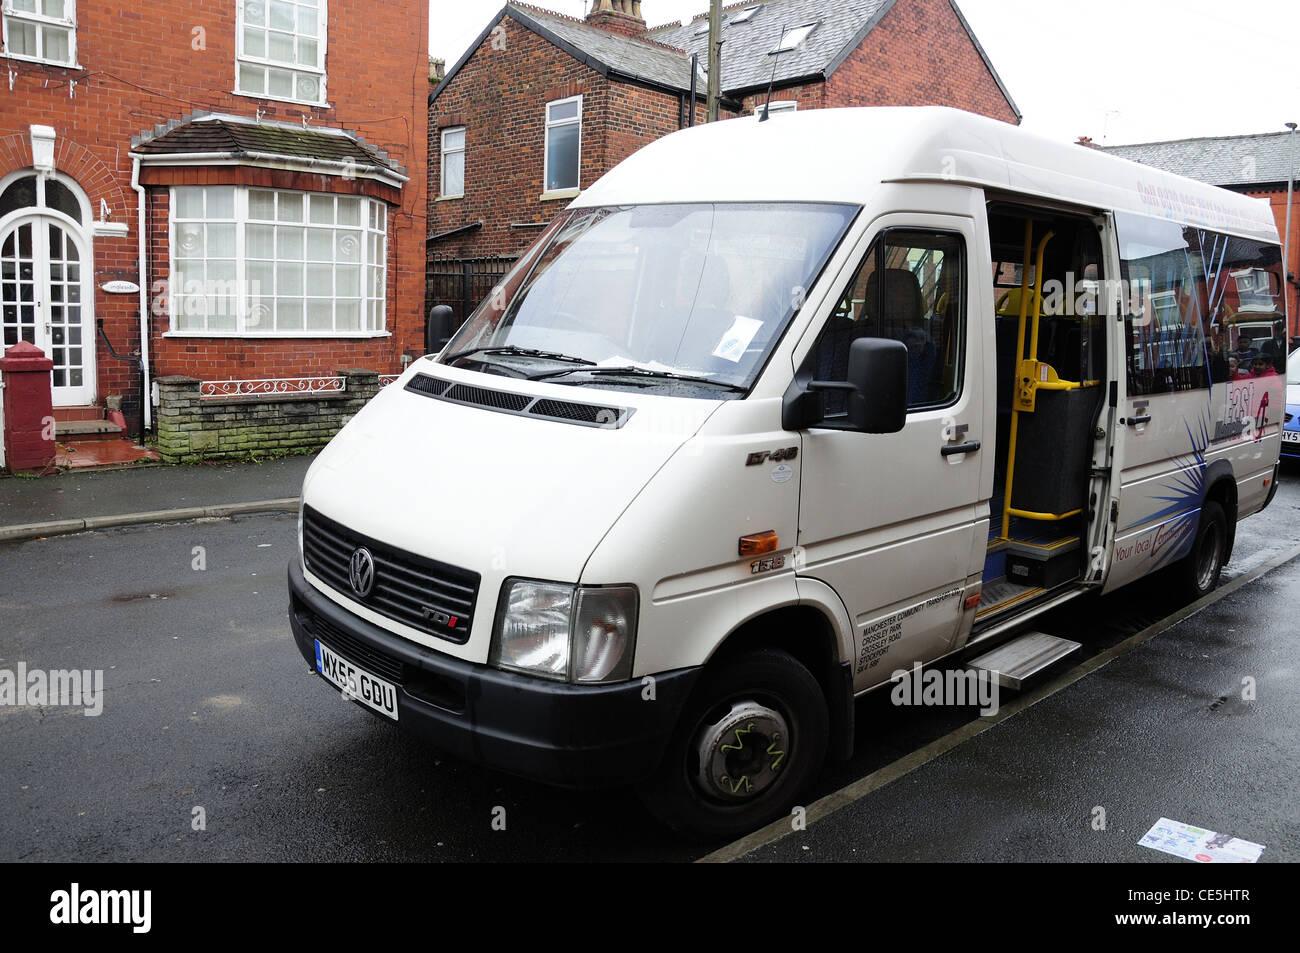 Community transport minibus - Stock Image